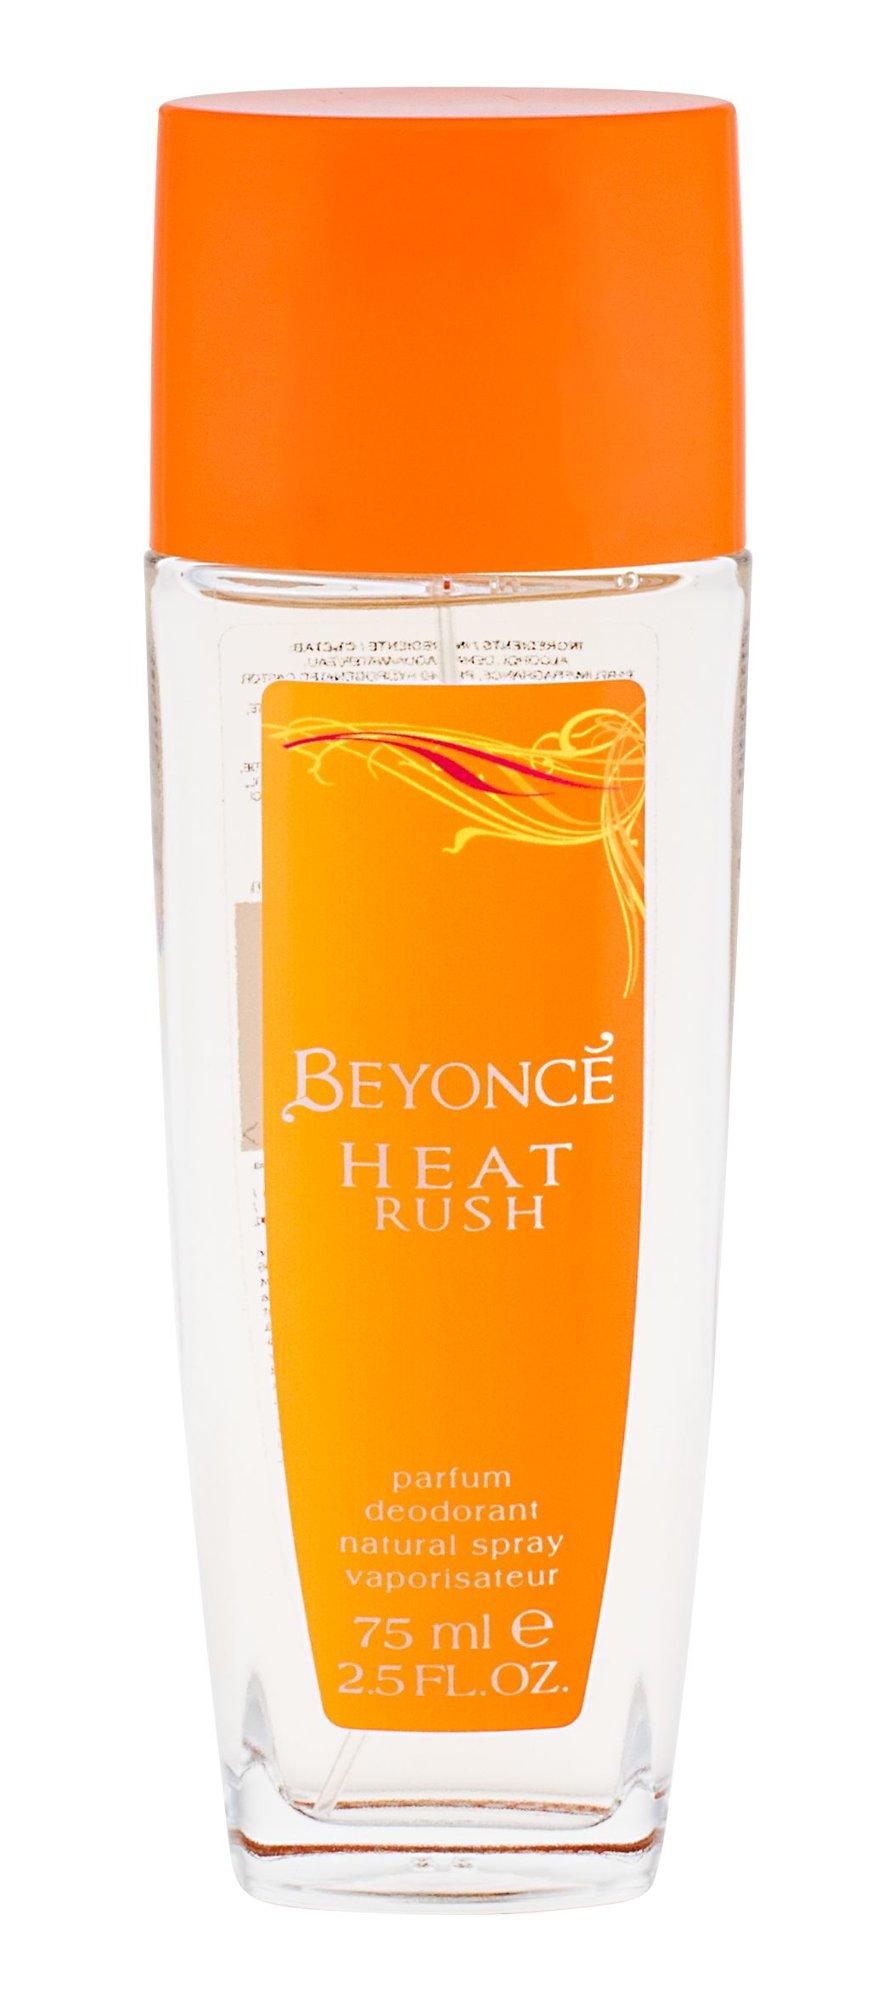 Dezodorantas Beyonce Heat Rush